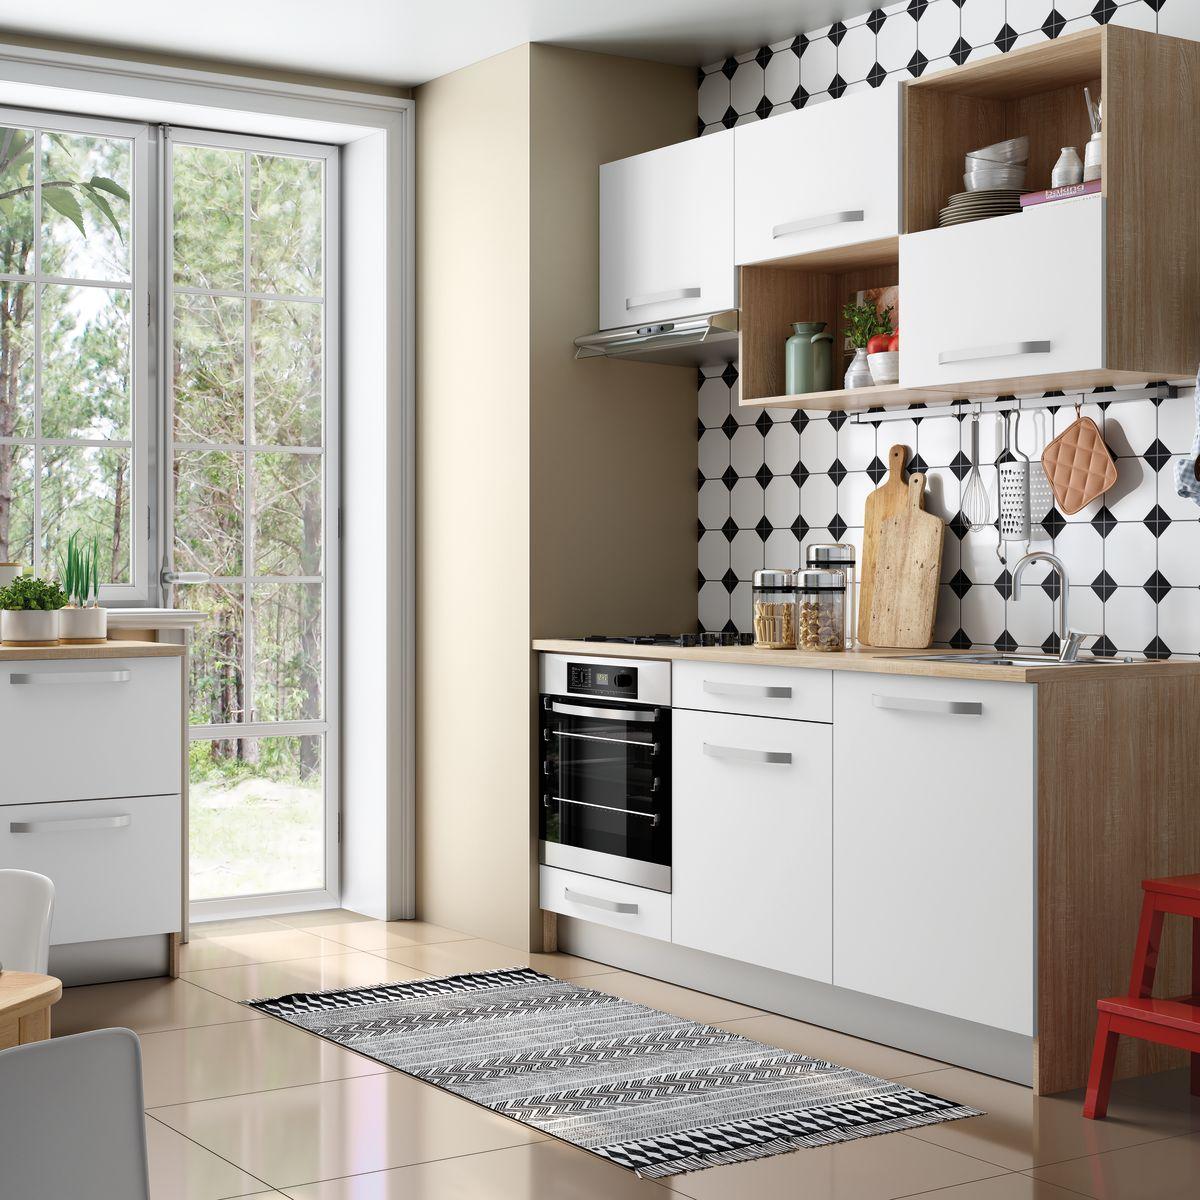 Strutture per cucine componibili free basi cucina in kit - Cremonas leroy merlin ...